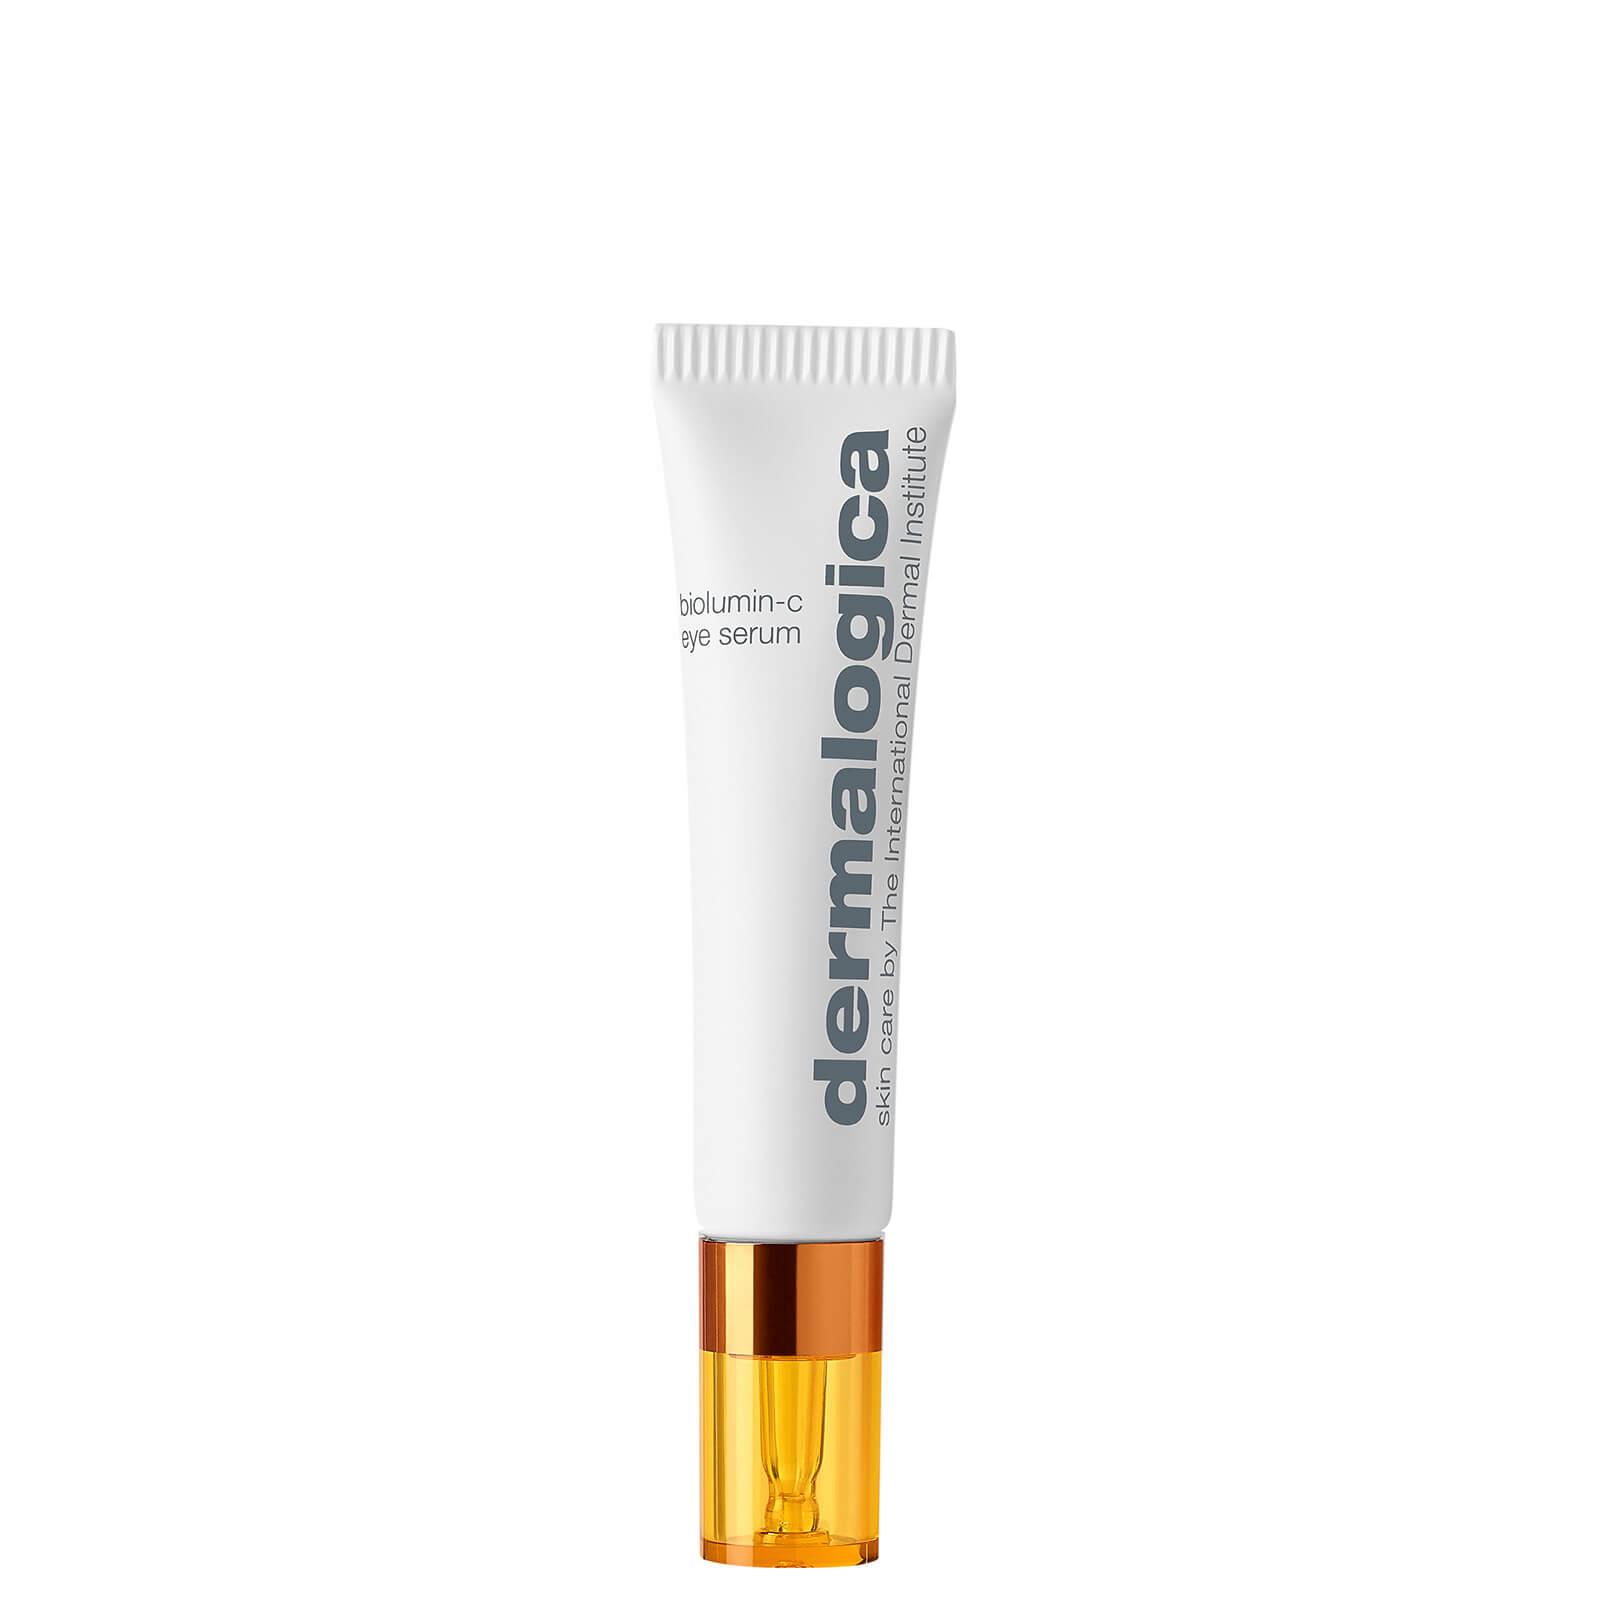 Купить Dermalogica Biolumin C Eye Serum 0.5 fl. oz